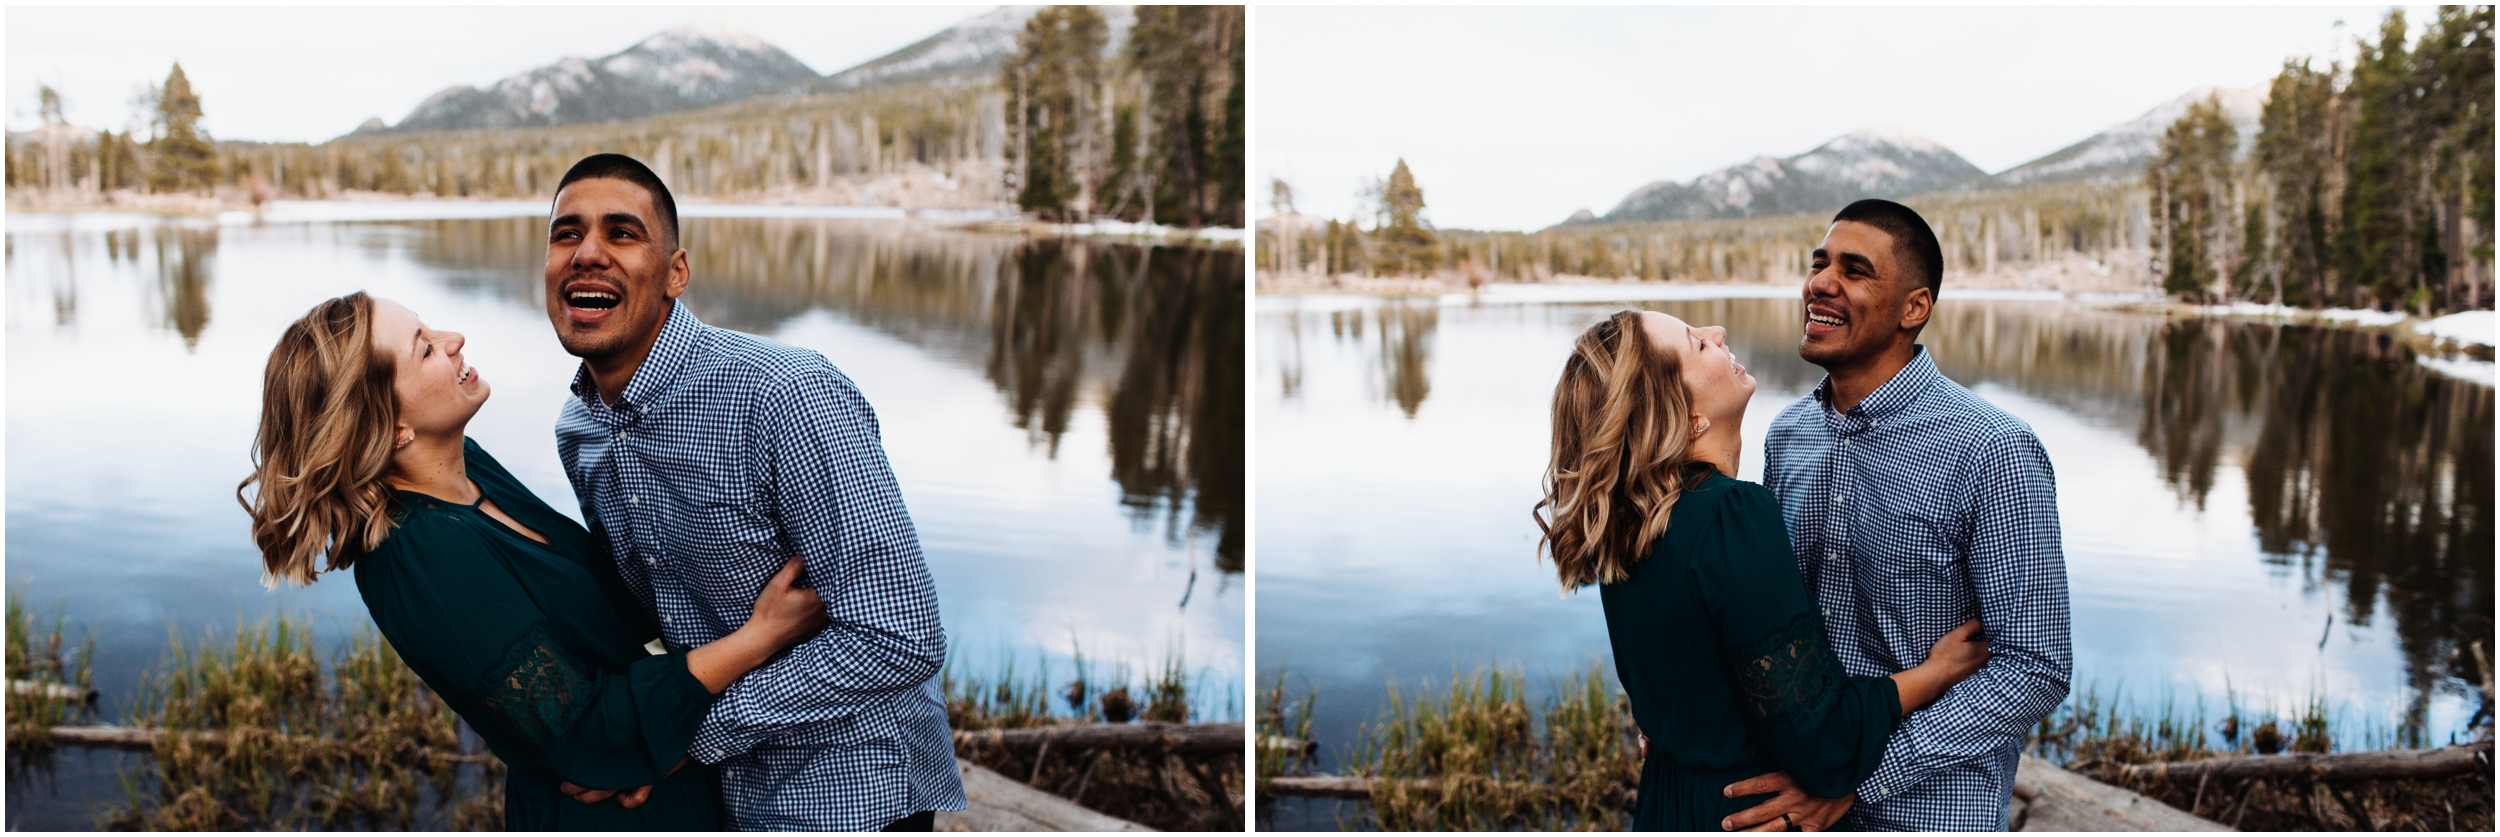 rocky-mountain-national-park-elopement-sprague-lake-colorado-adventure-wedding-photographer_taylor-powers_167.jpg